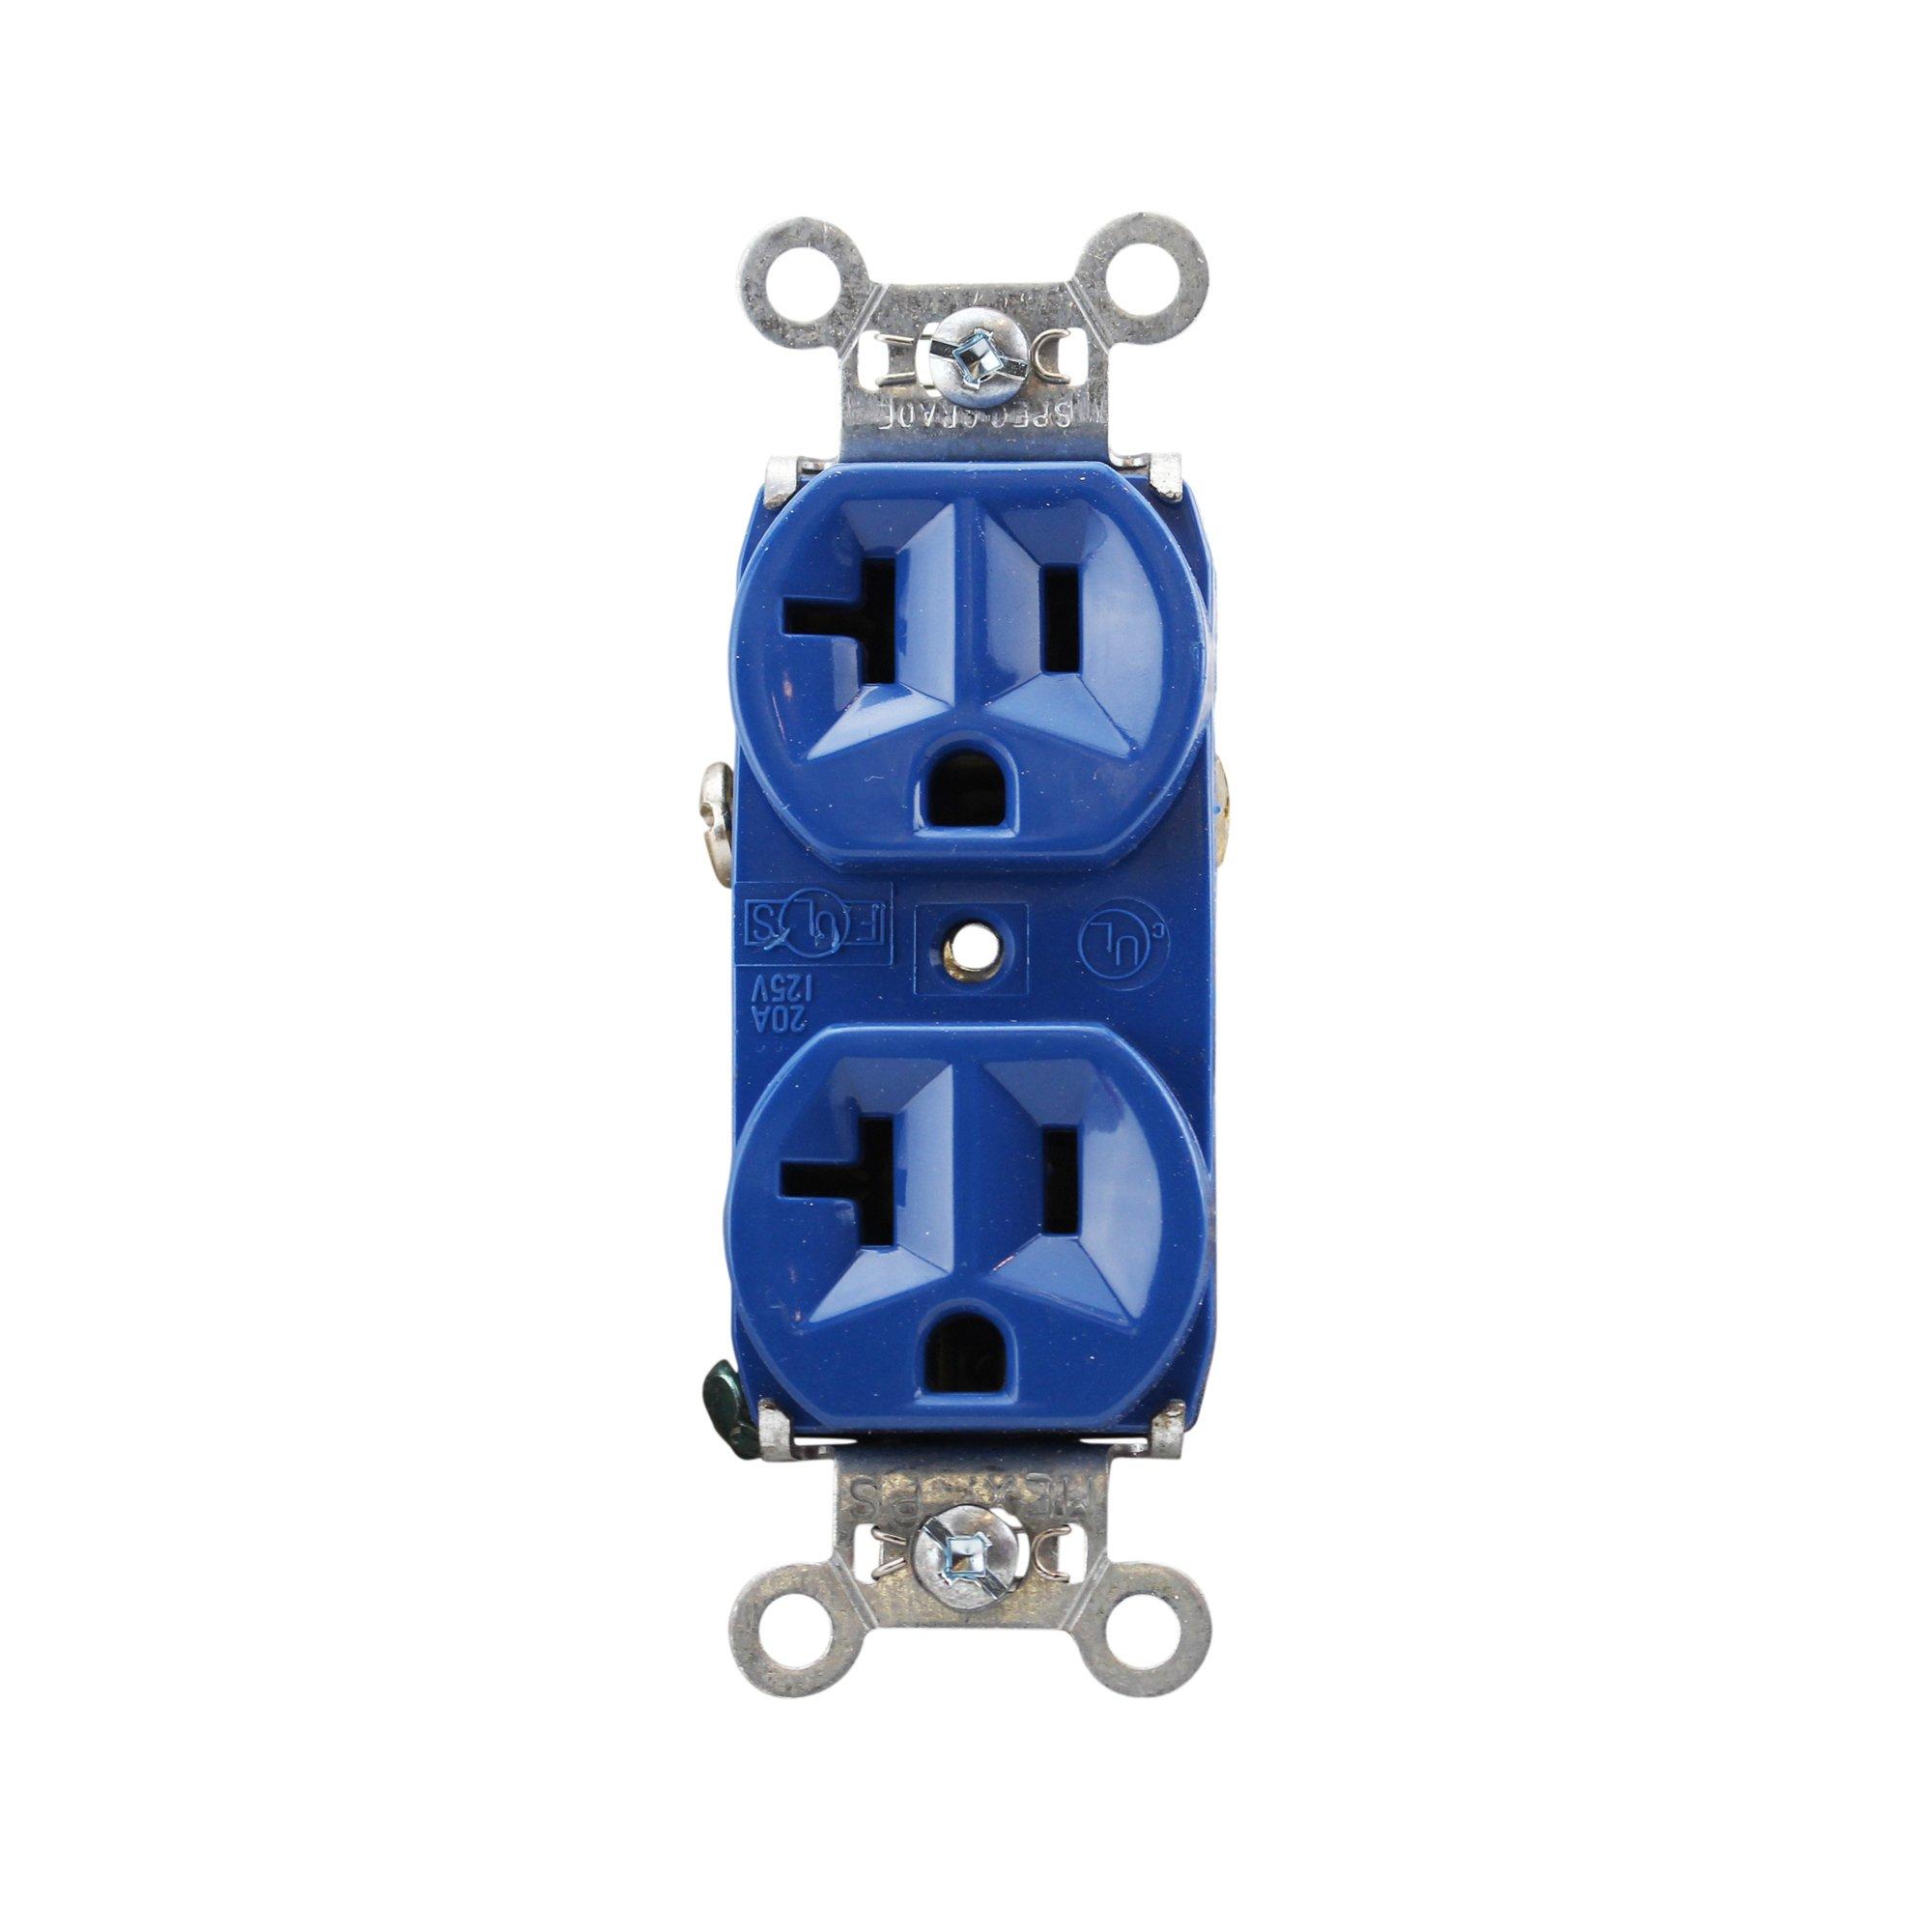 Pass & Seymour 5362-BL Duplex Receptacle Industrial Spec 20A 125V, Blue (10 Pack)